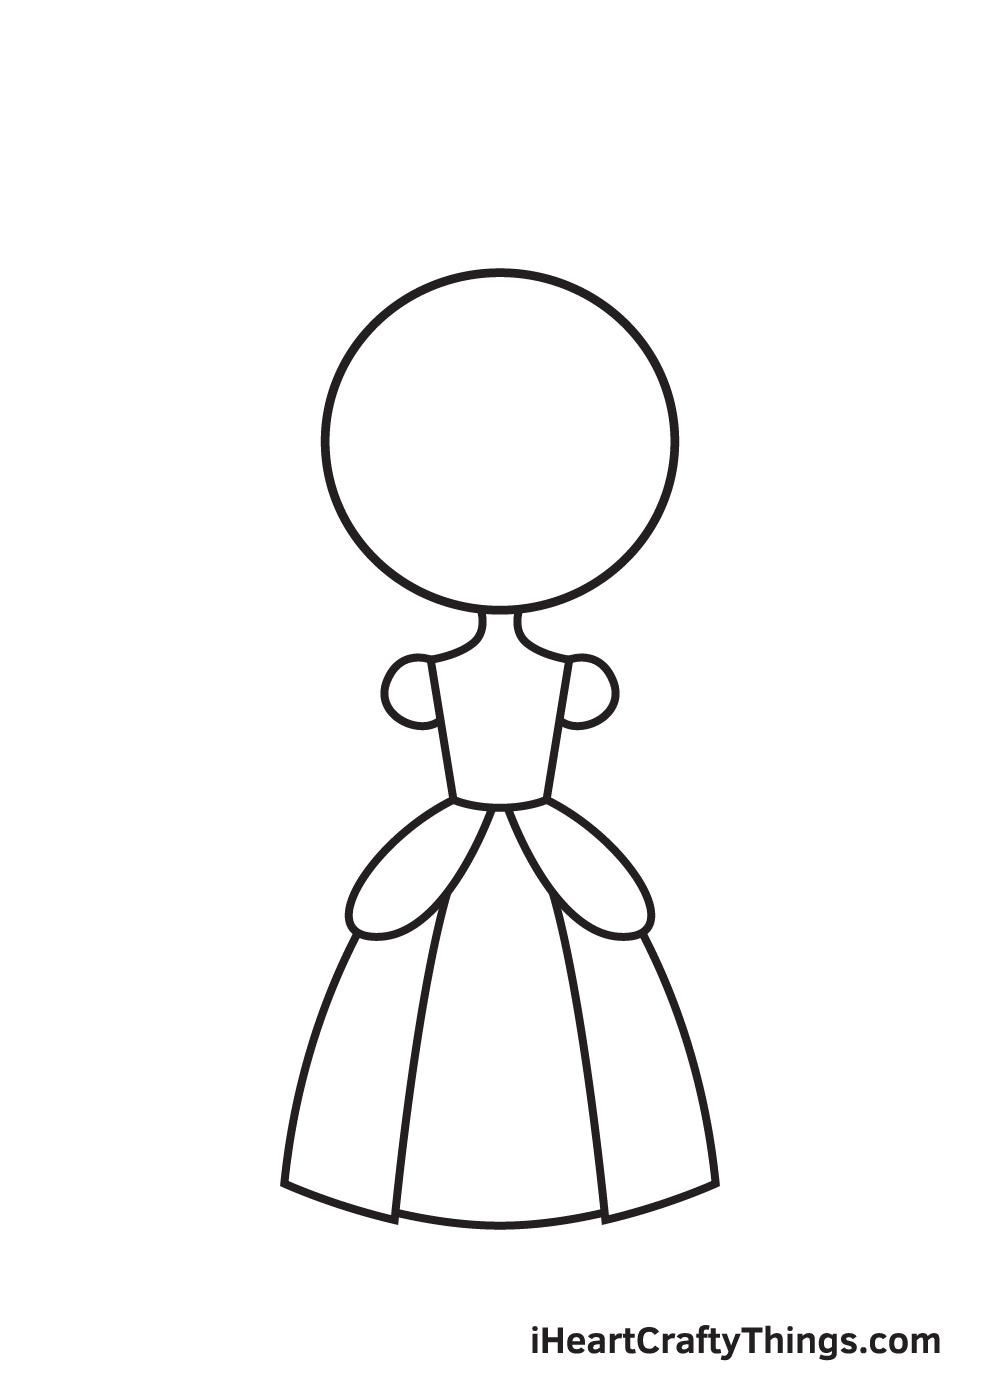 Princess Drawing – Step 5